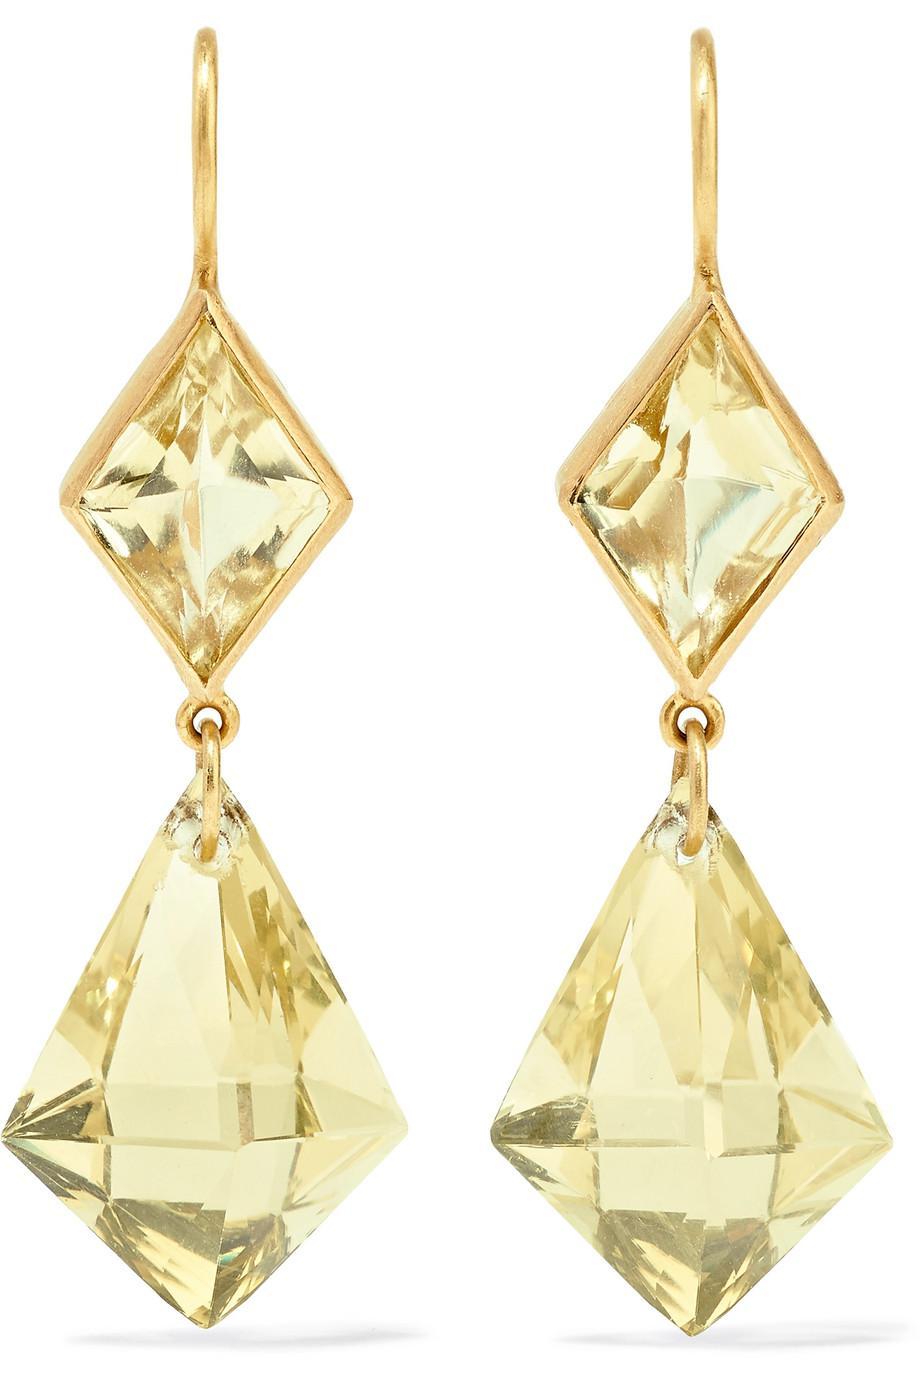 Marie-Hélène de Taillac 22-karat Gold Quartz Earrings q0DB16g001